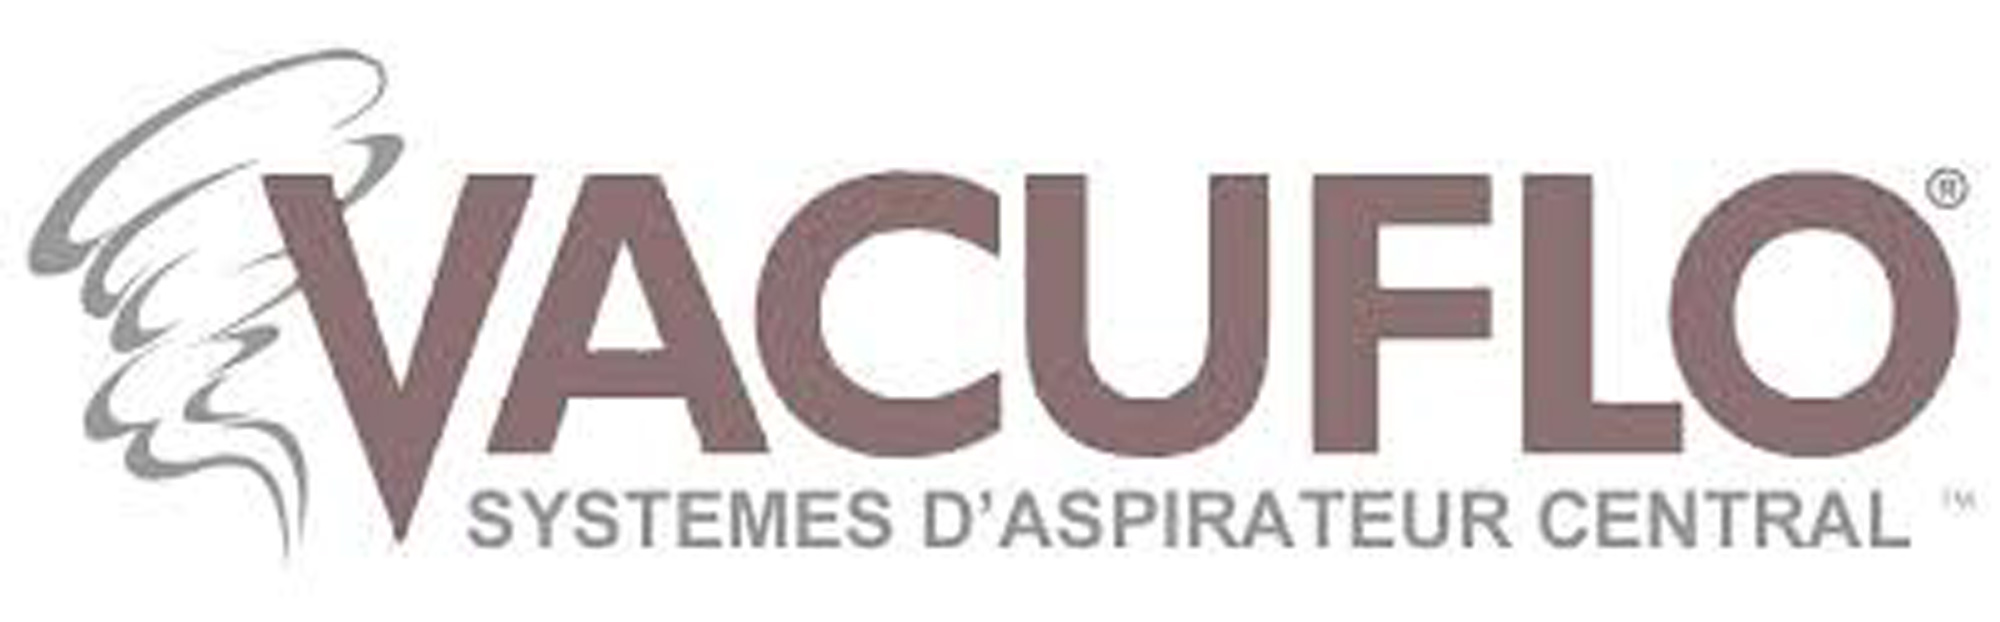 logo-vacuflo